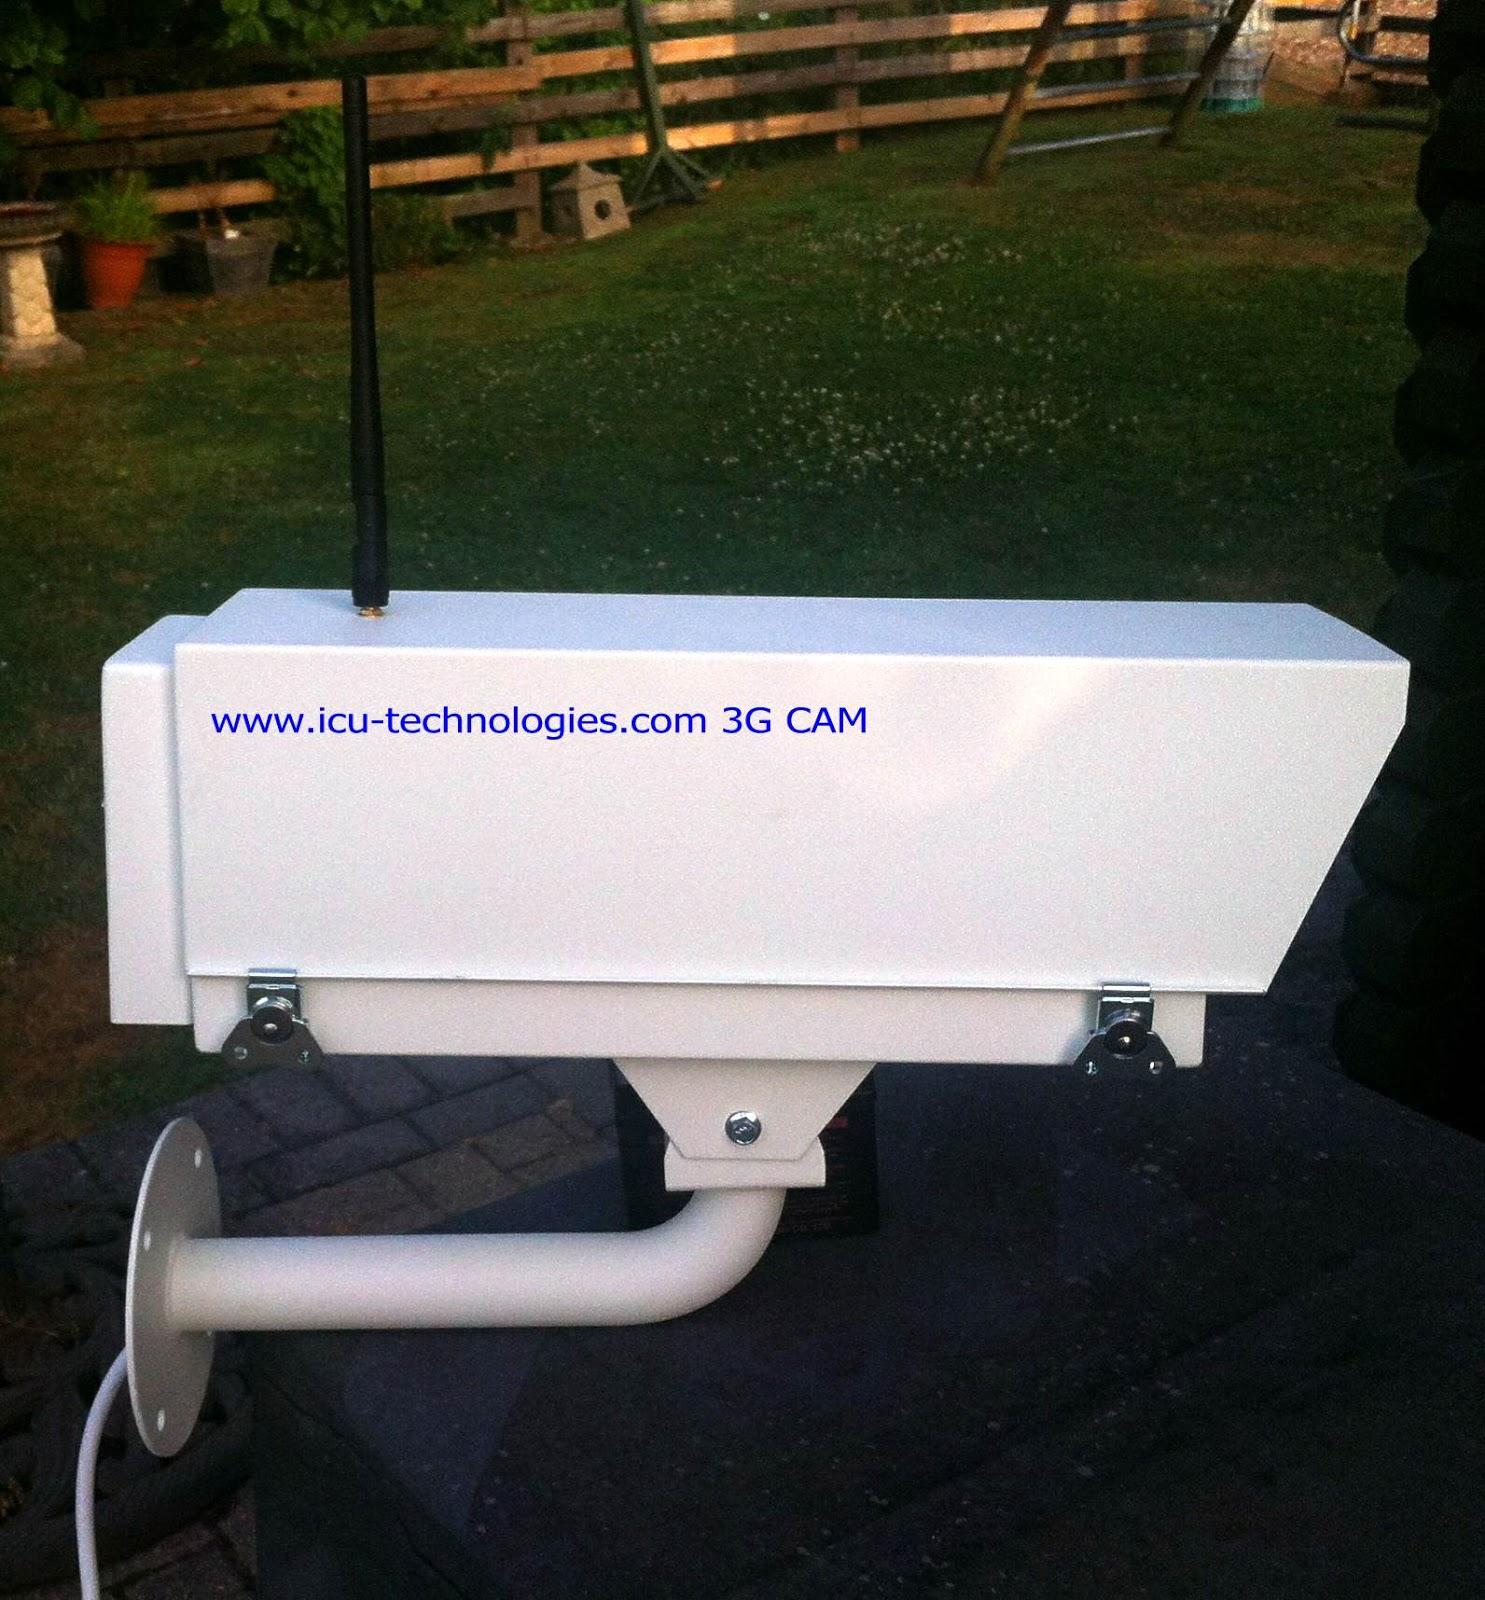 CCTV data sim fixed IP